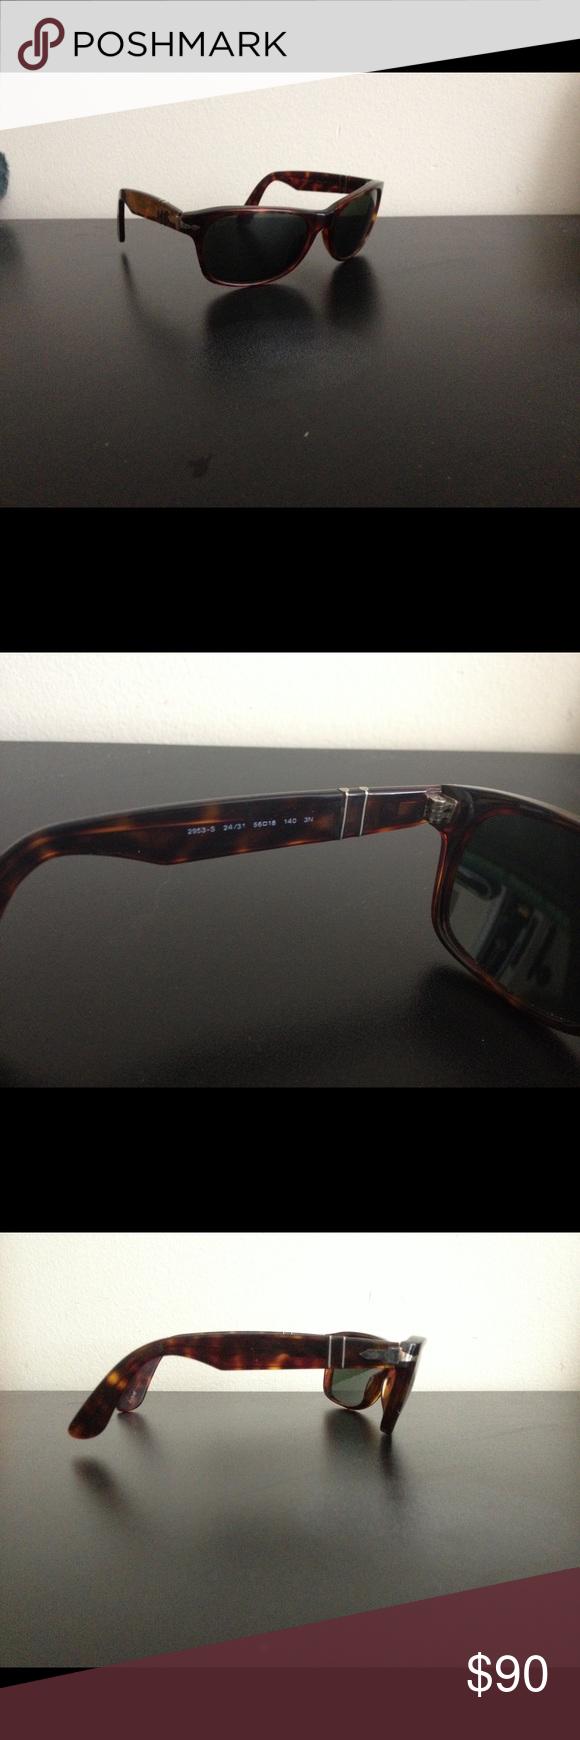 Persol sunglasses with original case